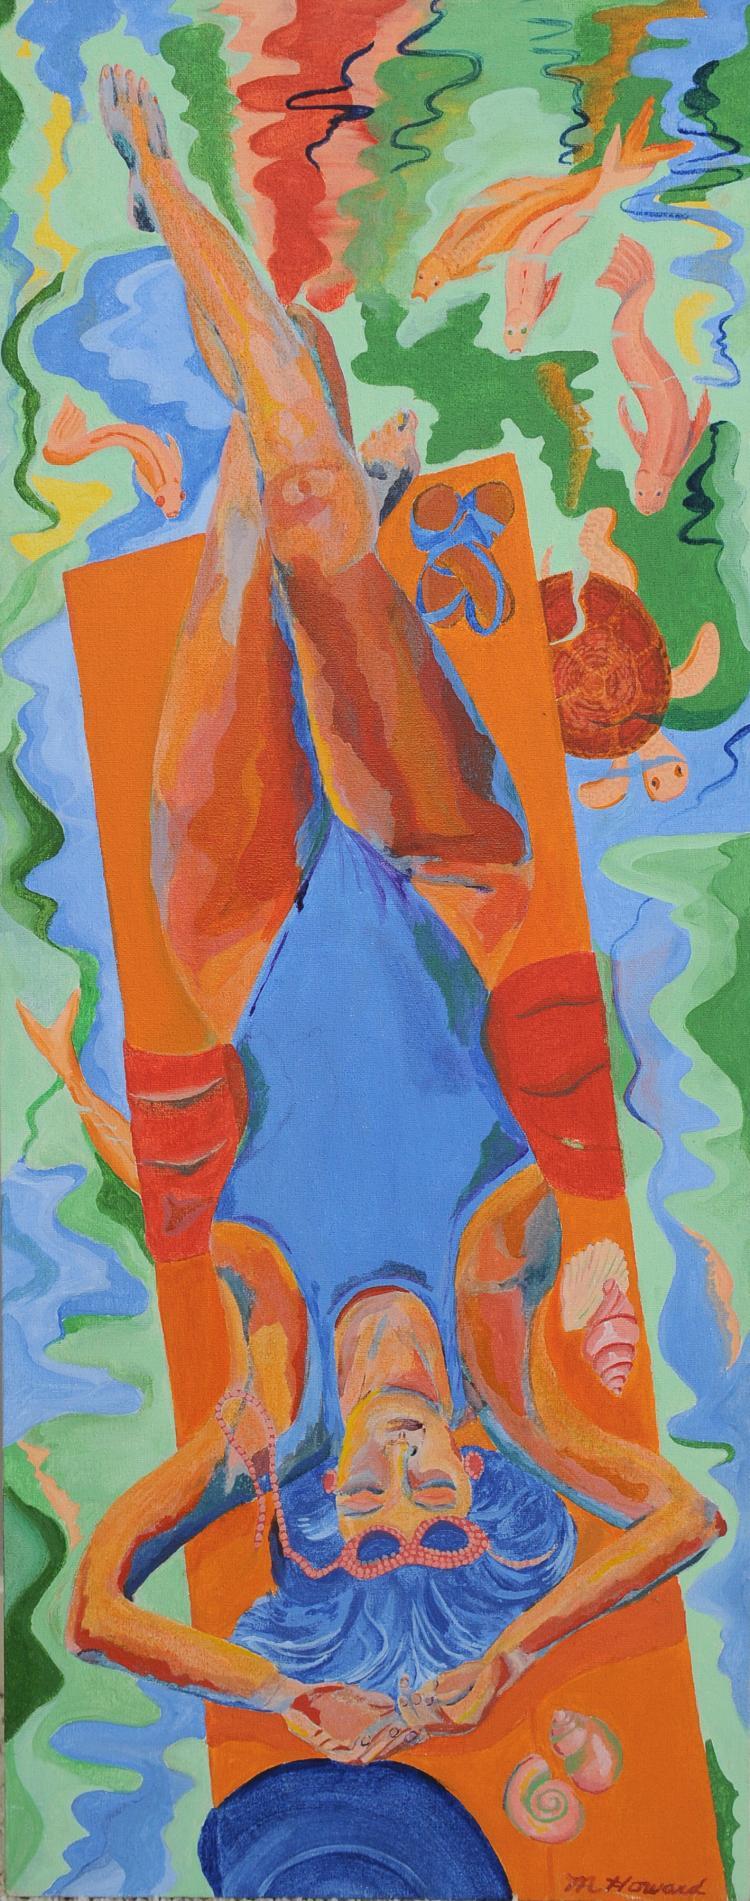 Woman on Raft, Oil on Canvas, Mary Howard